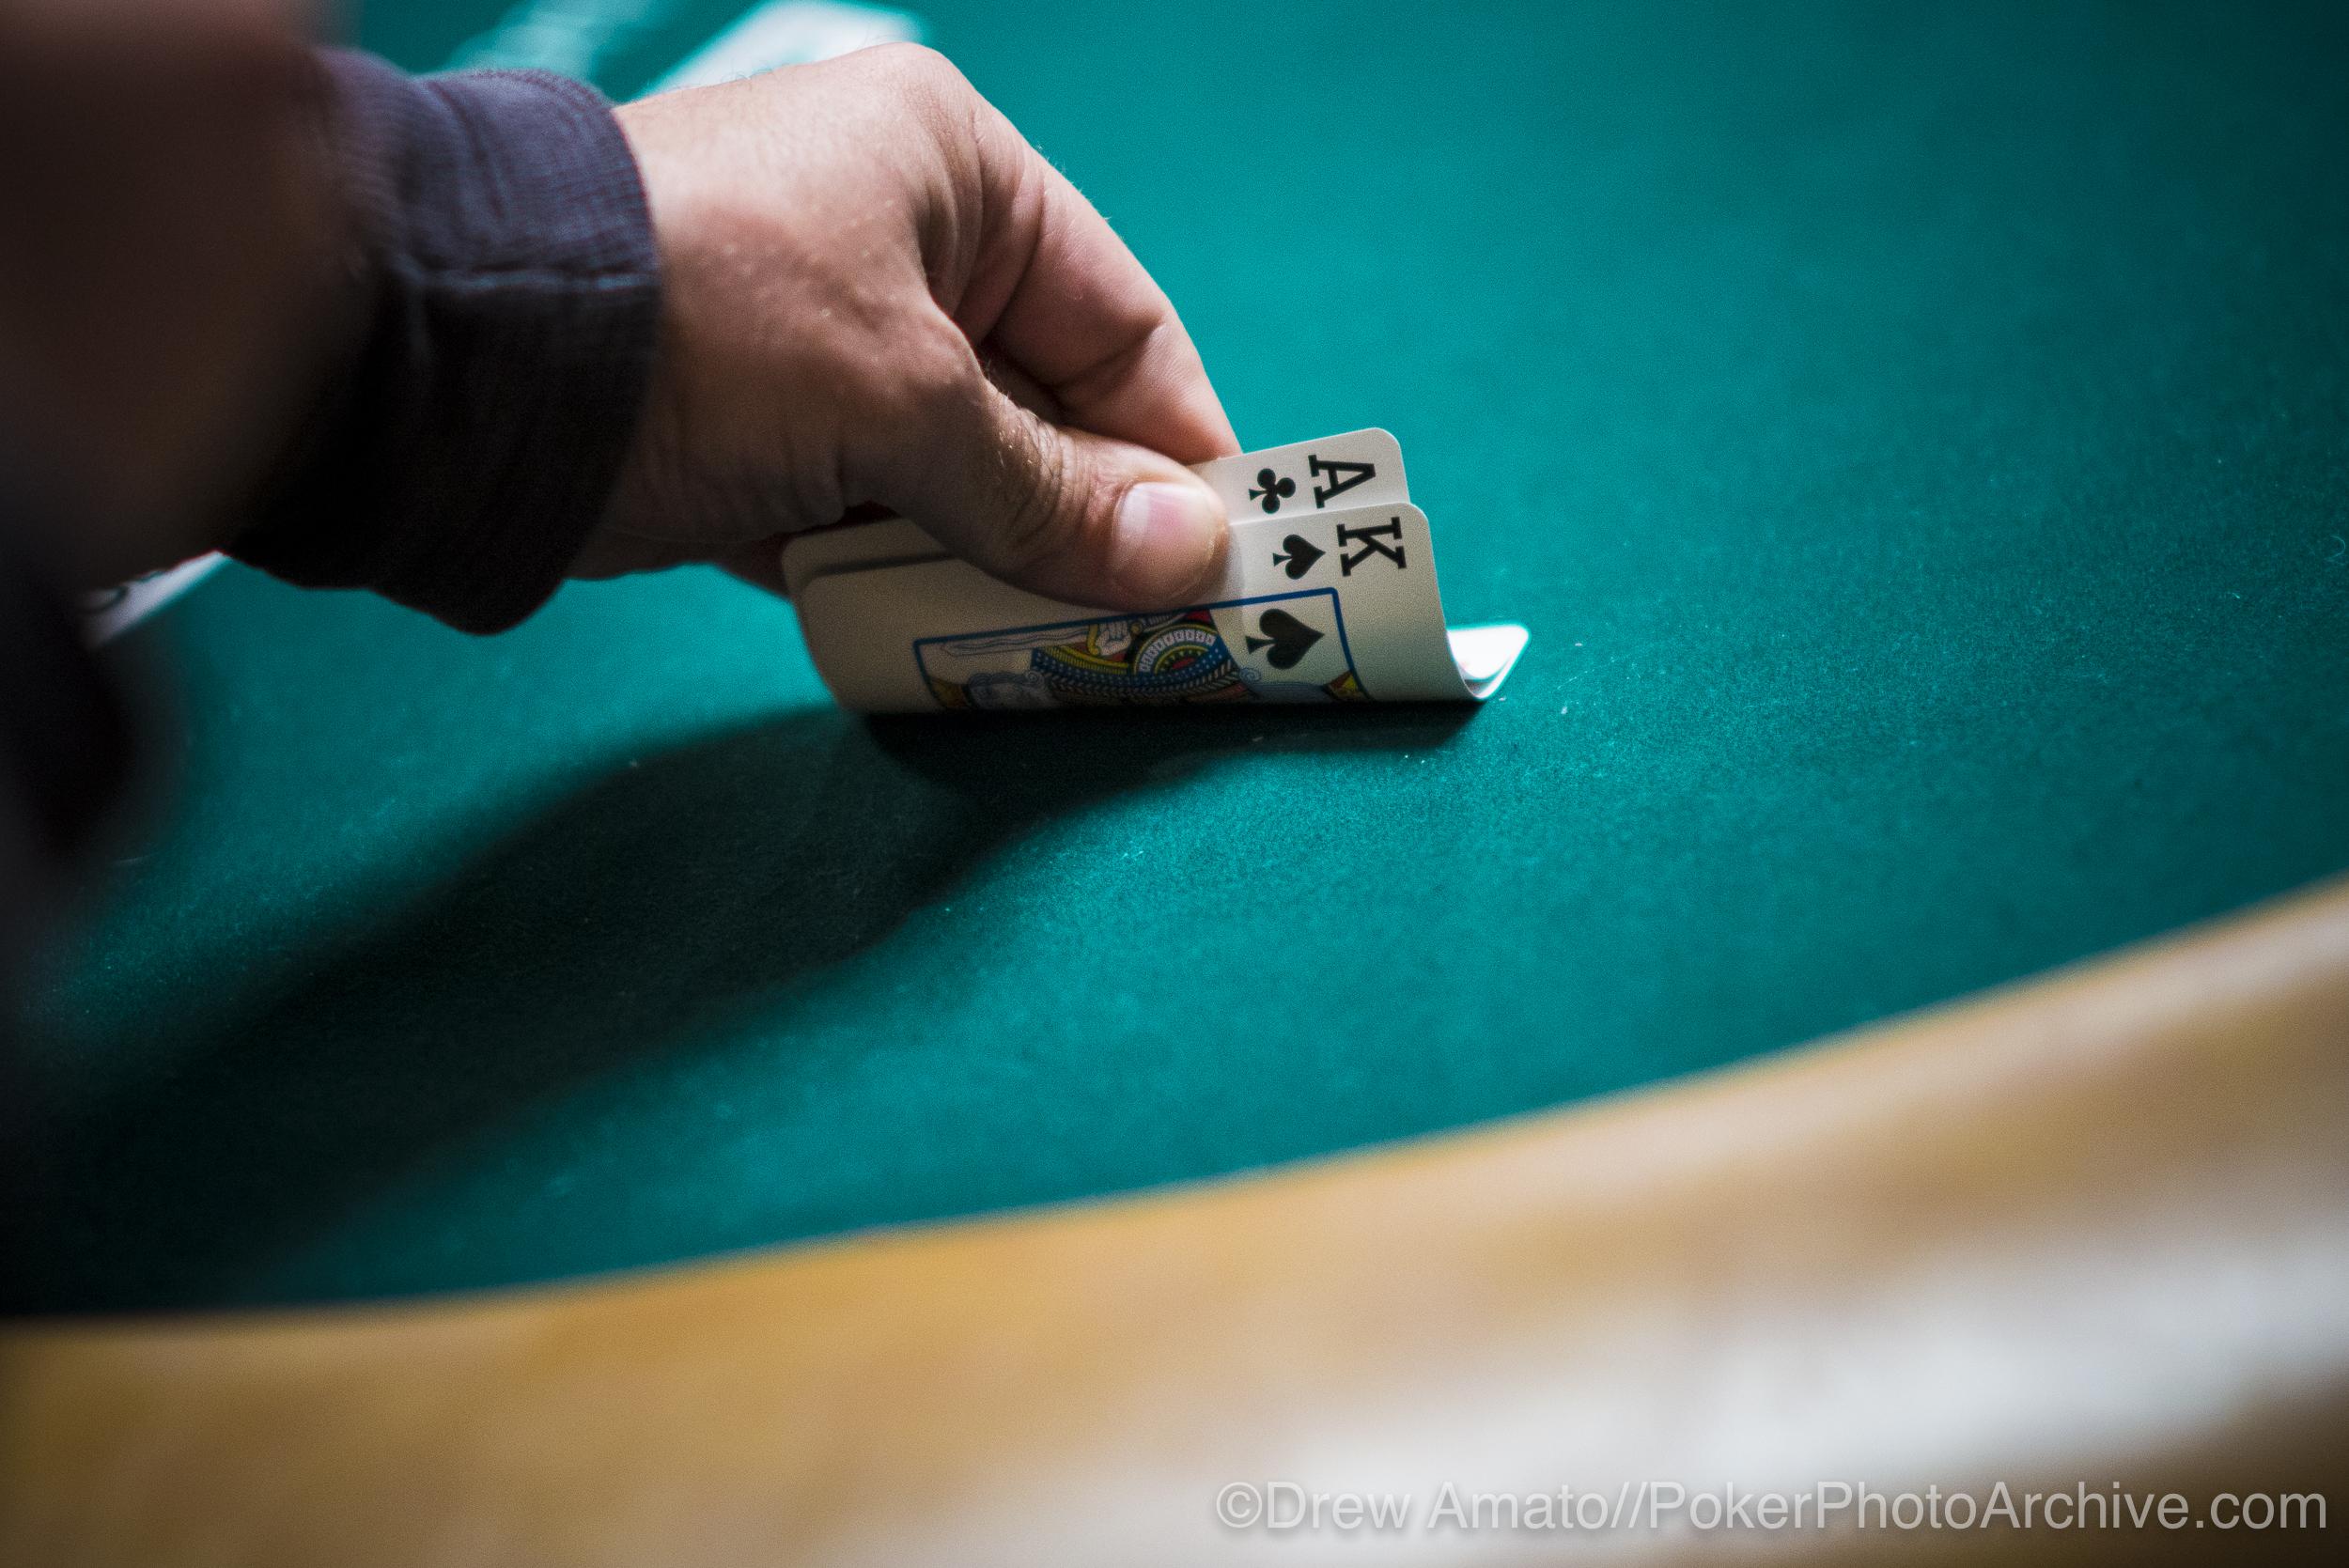 Ace-King_2017 WSOP_EV010_Day 3_Amato_DA65942.jpg